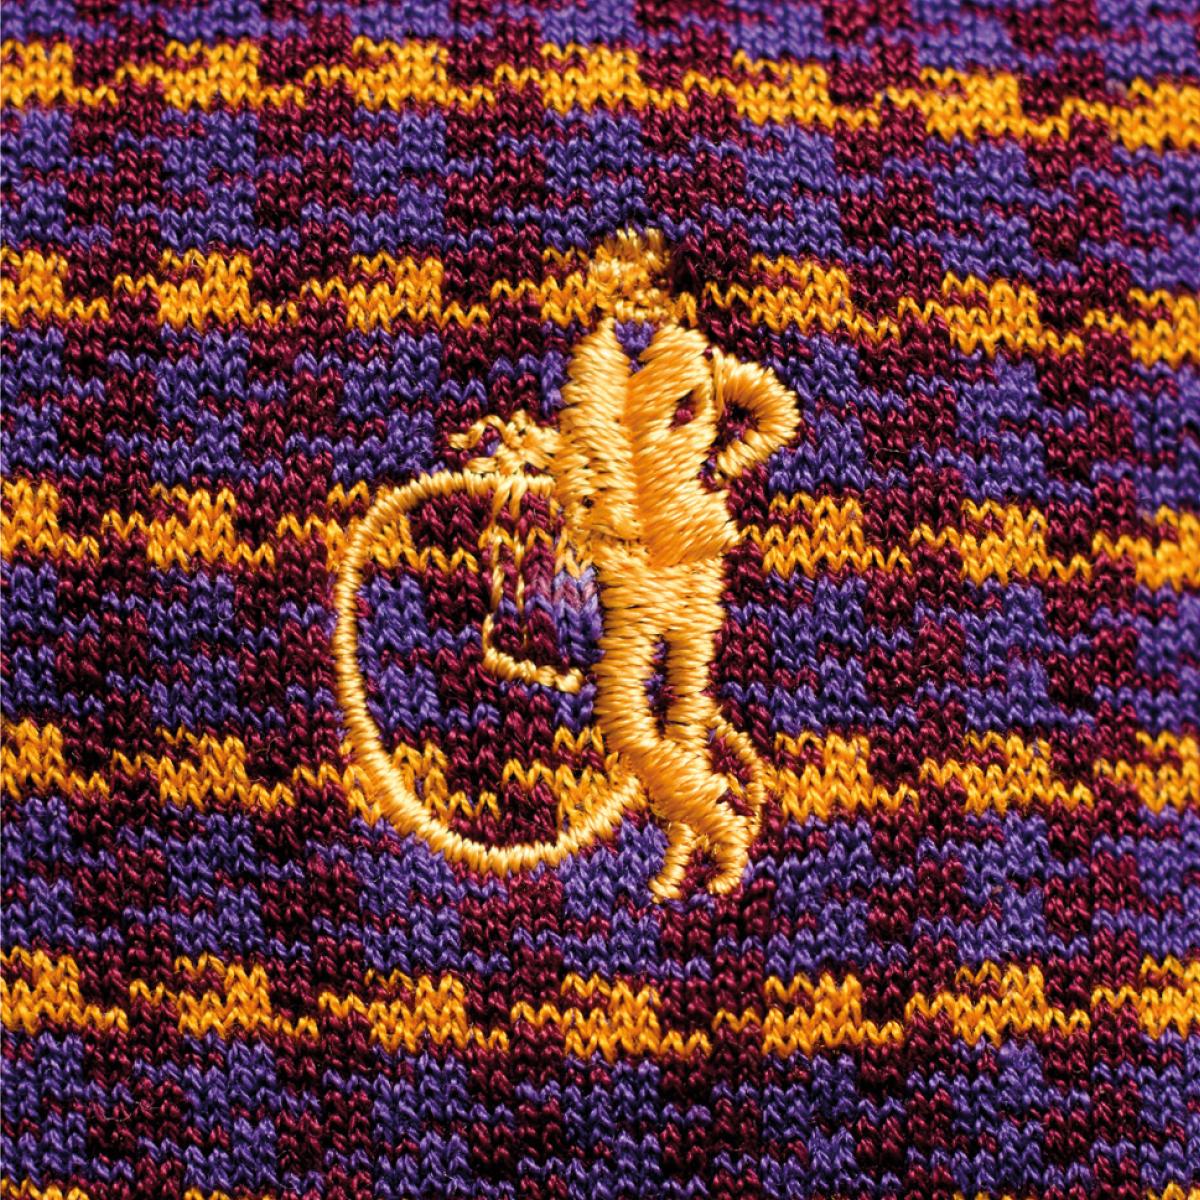 London Sock Company logo embroidered on sock